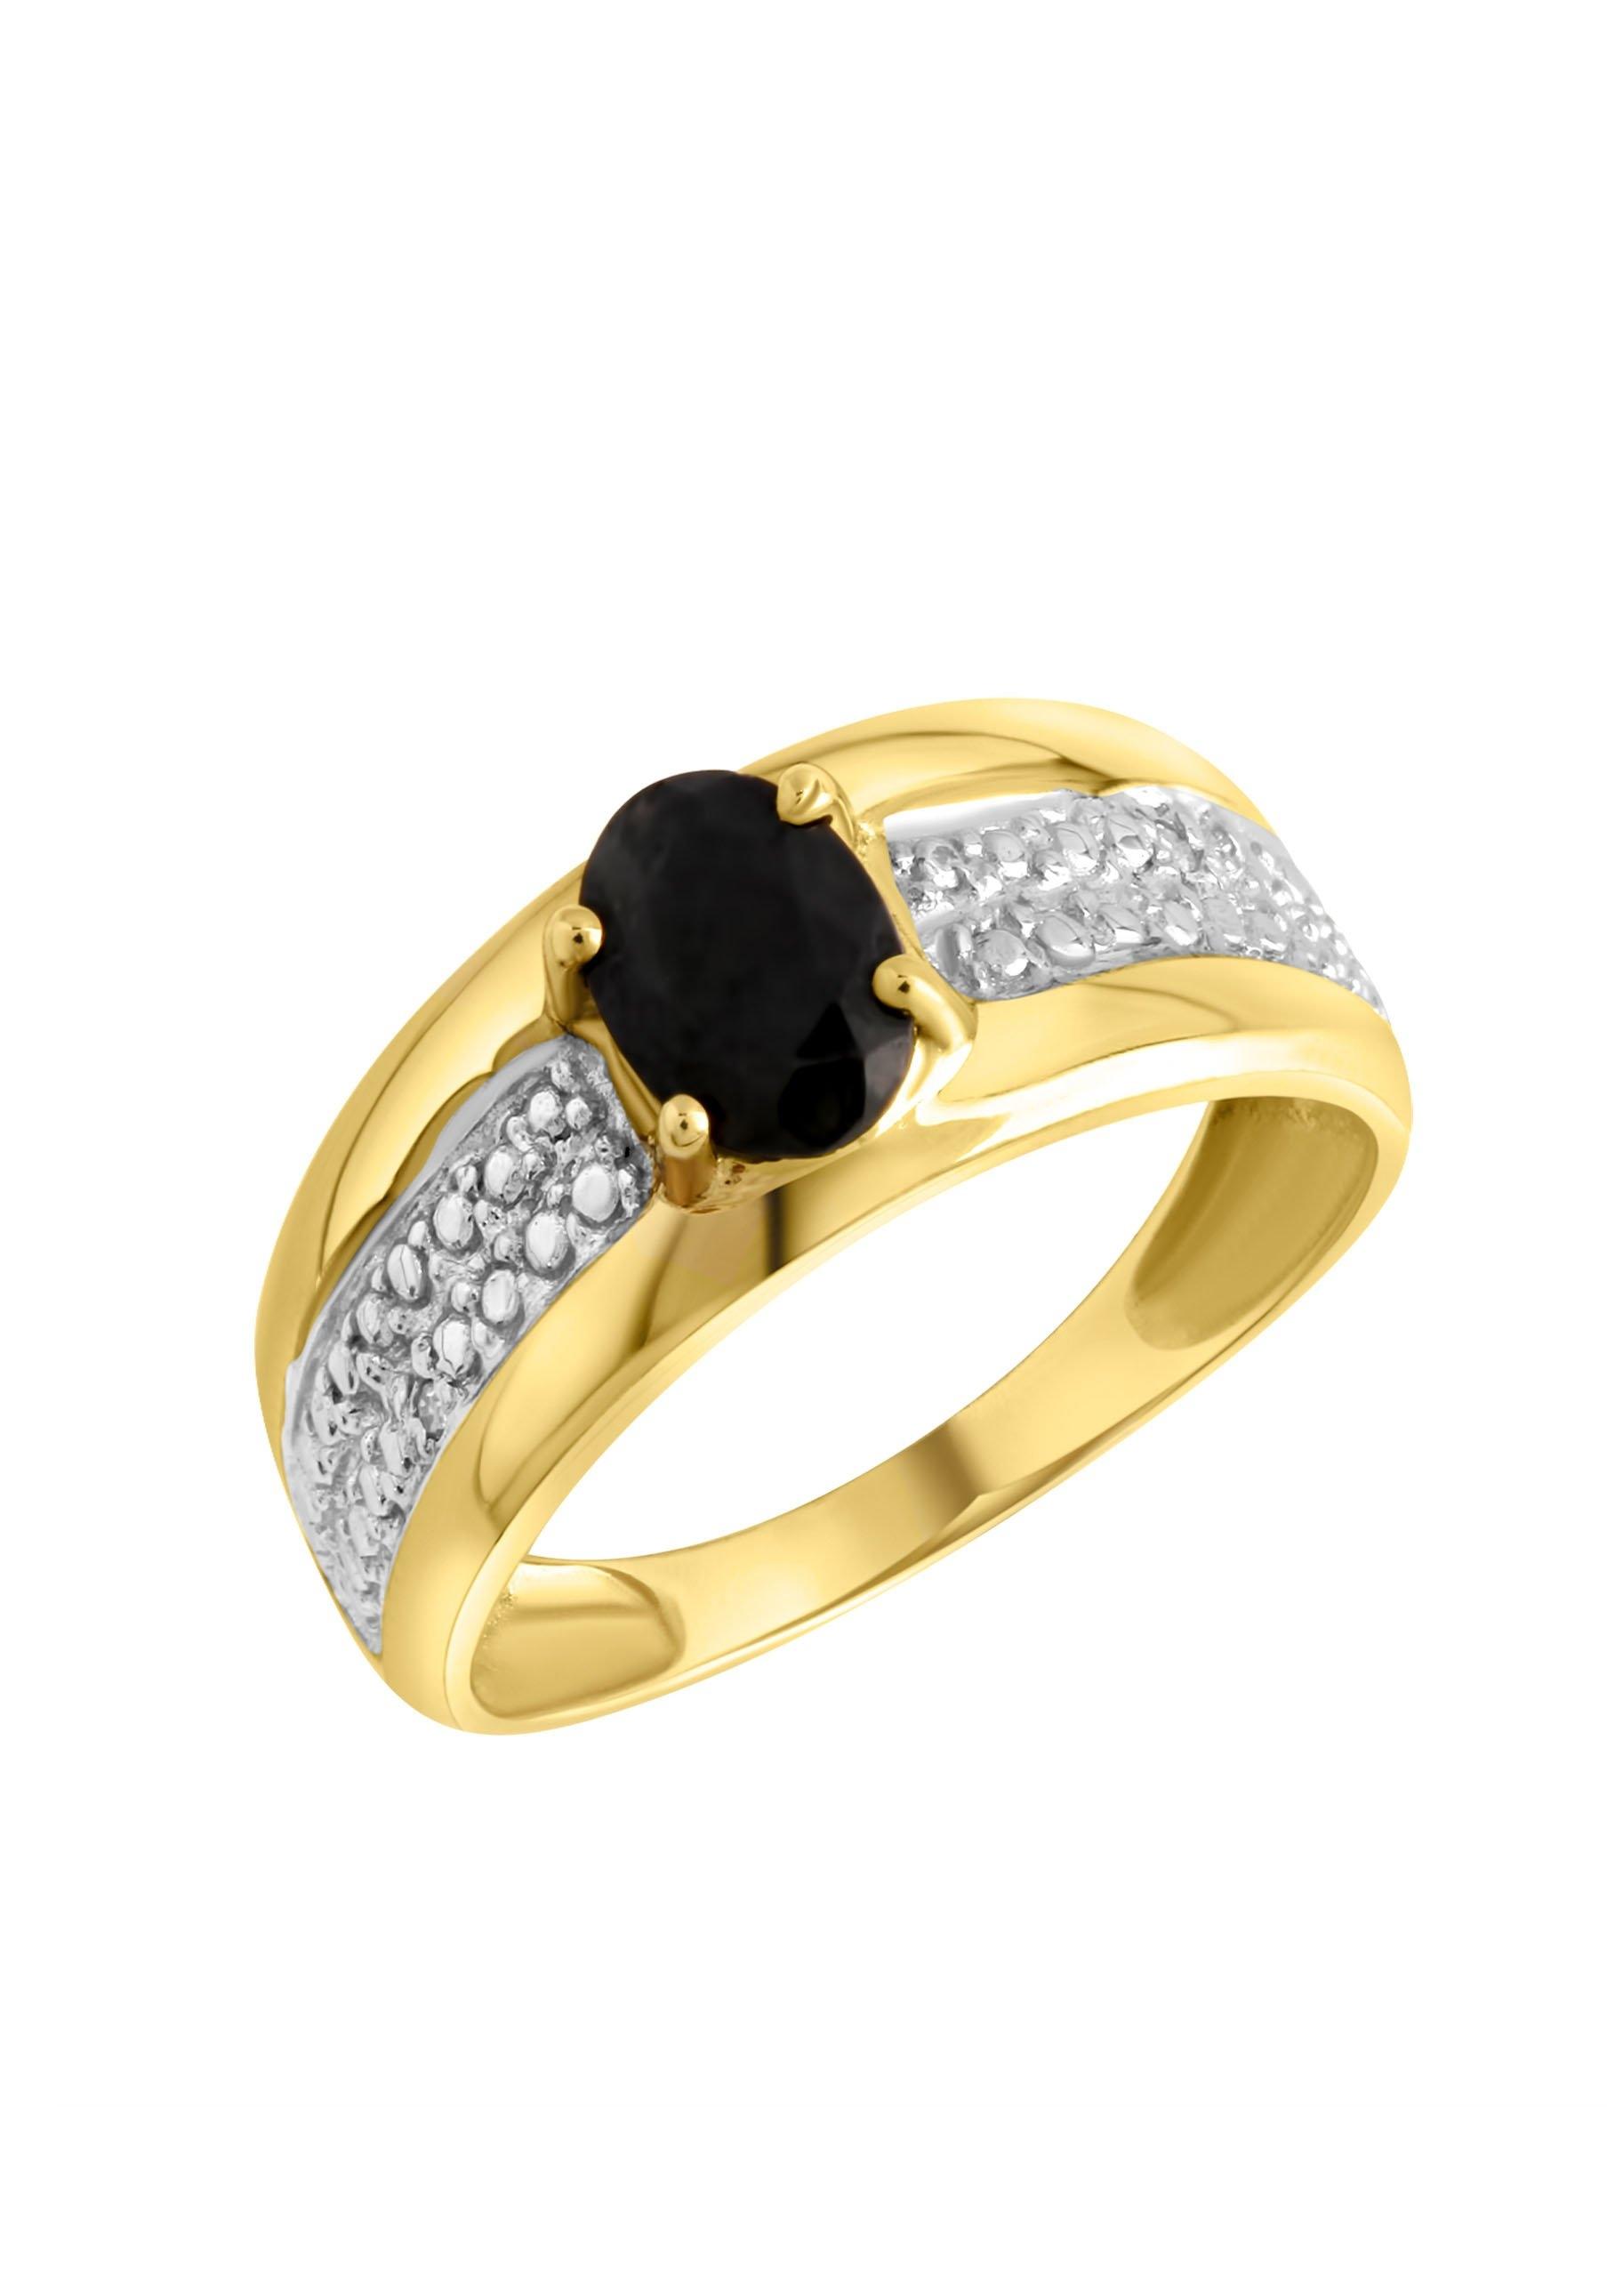 Firetti gouden ring In bicolour-look met saffier nu online bestellen